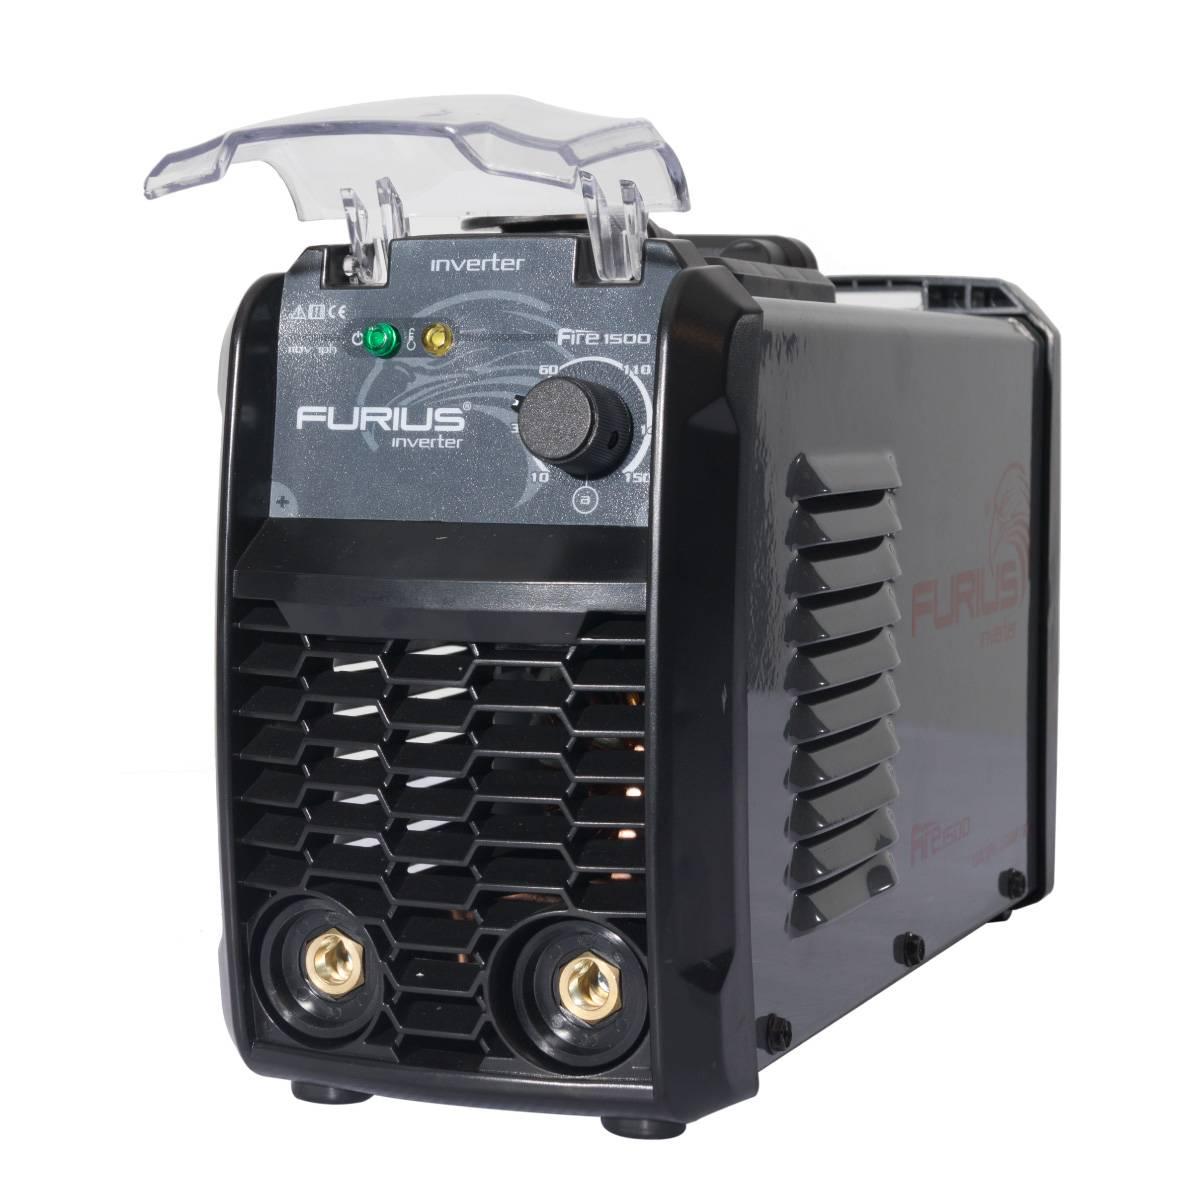 Soldadora Inversora Inverter CT40% 110v 1HP Fire 1500 Furius